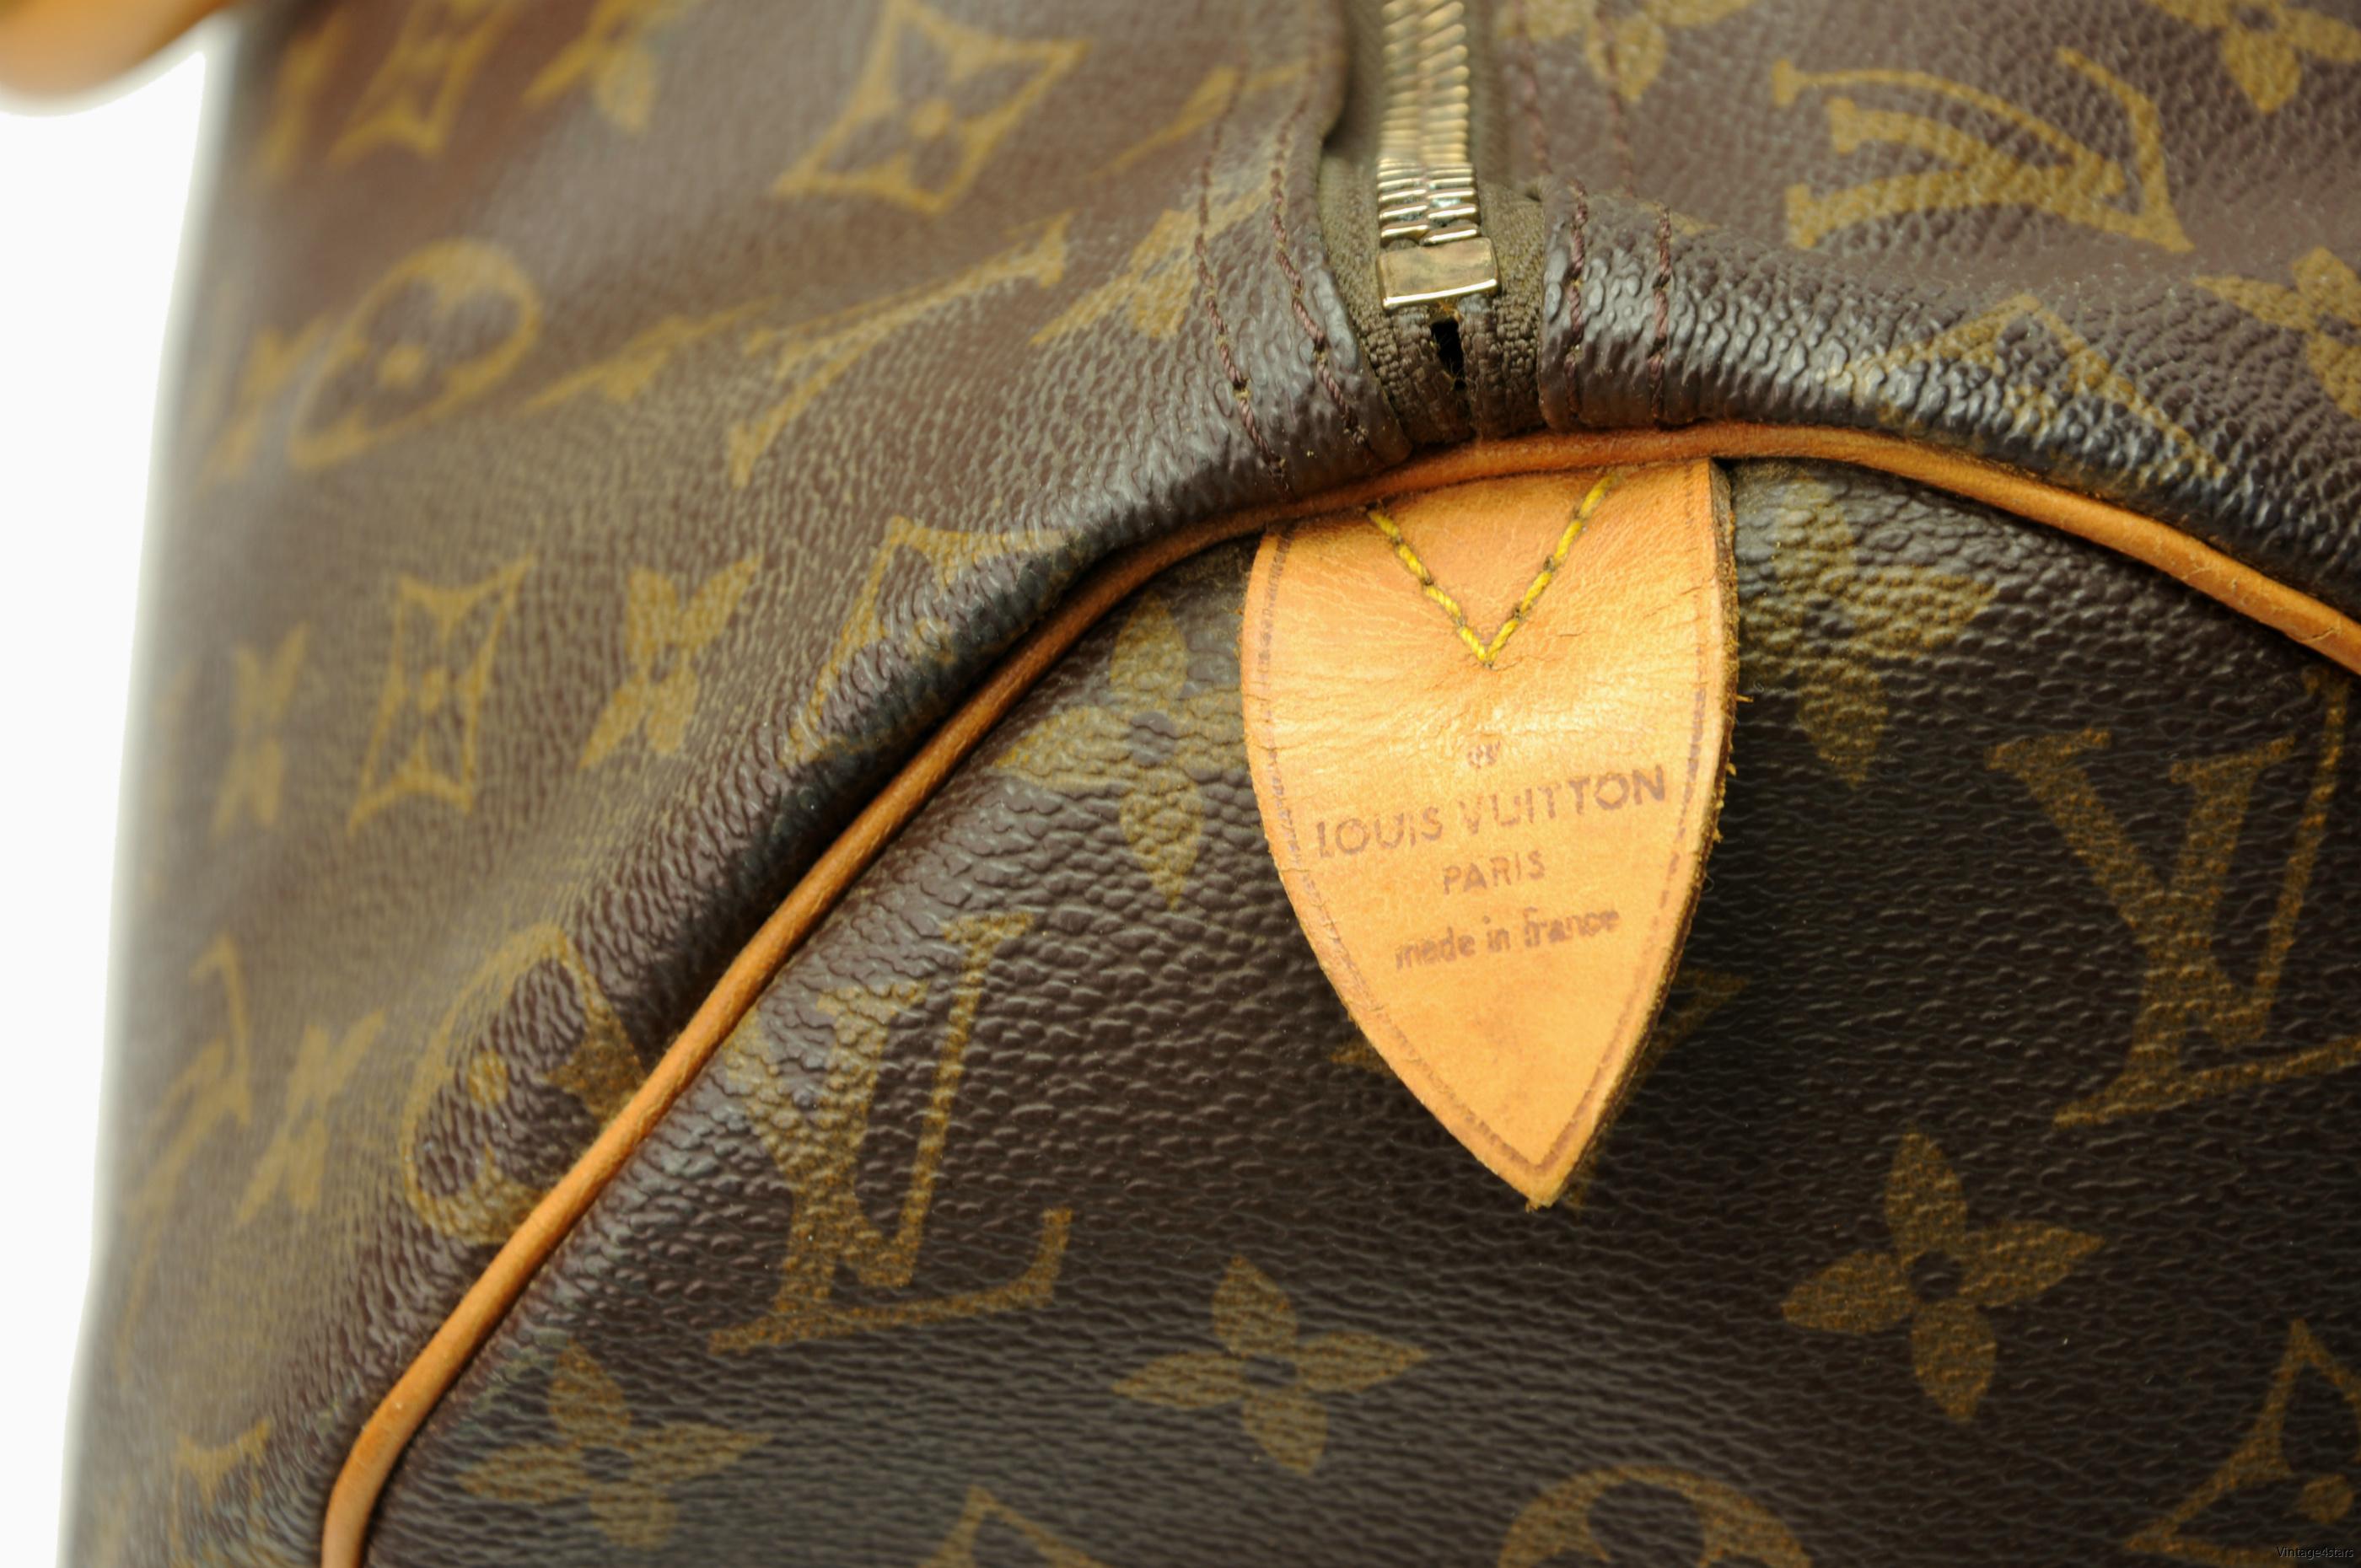 Louis Vuitton Speedy 40 Monogram 13